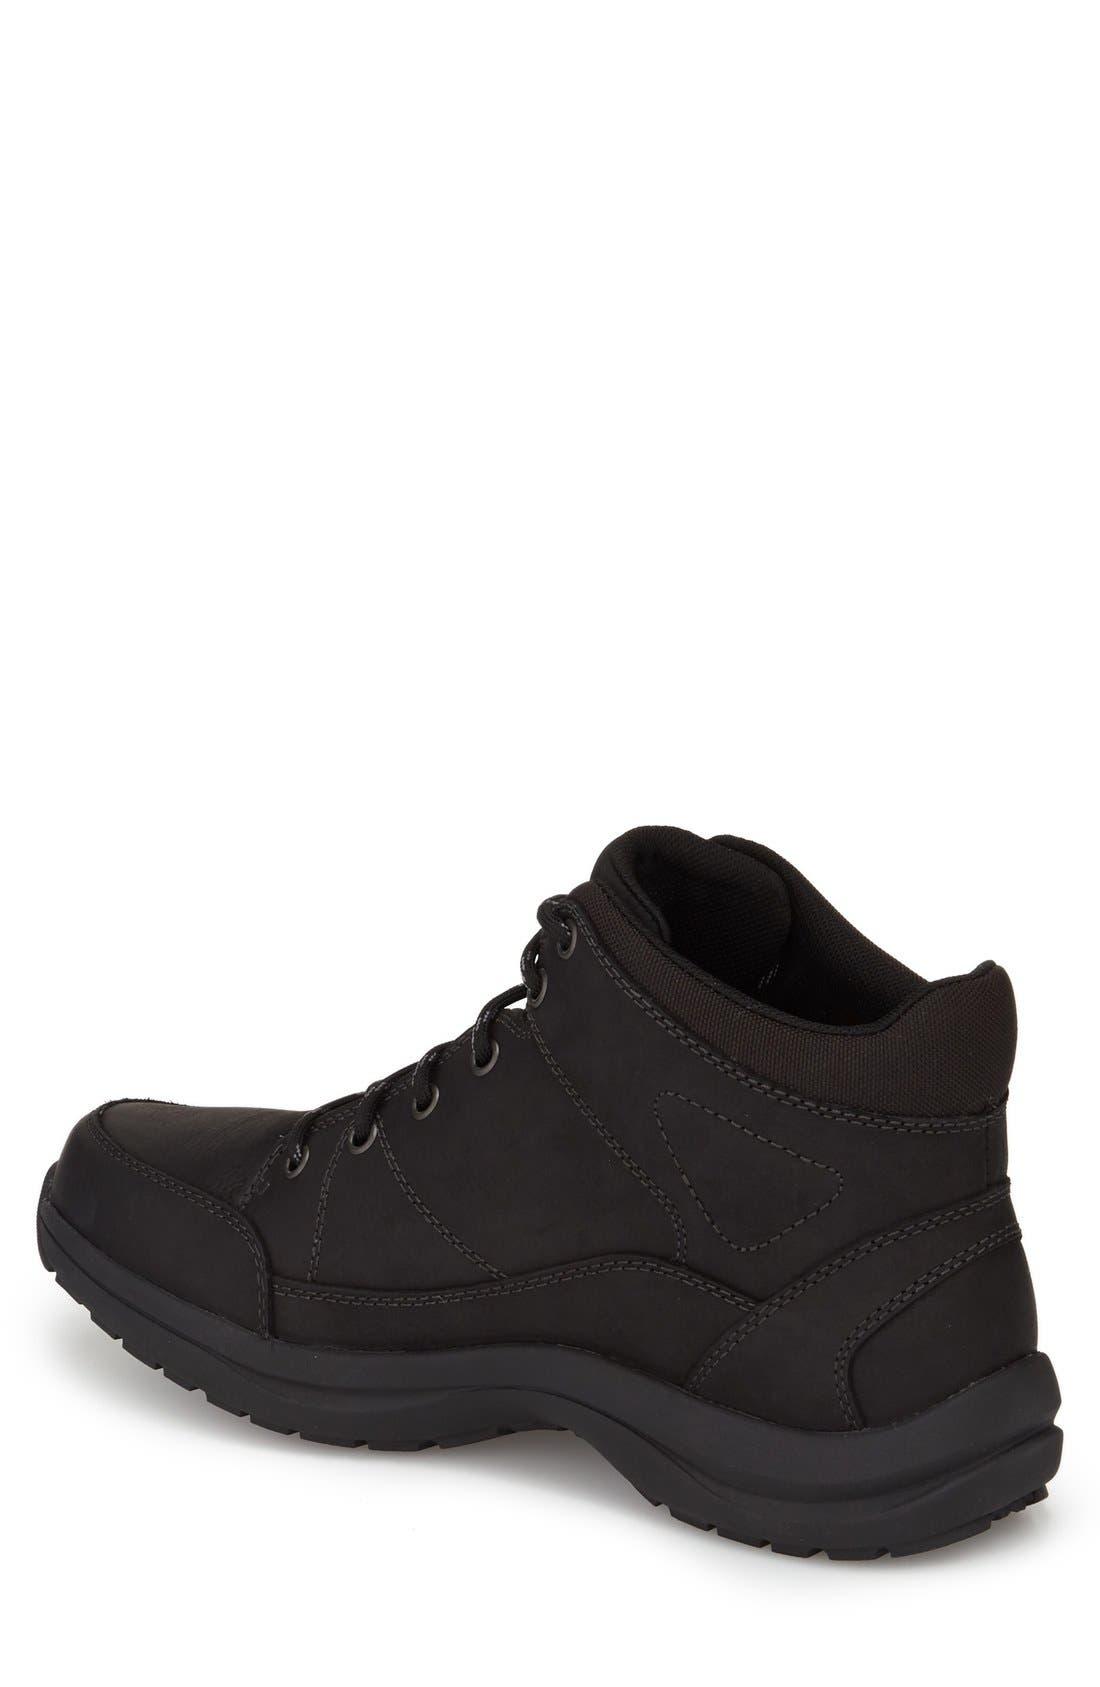 Simon-Dun Waterproof Boot,                             Alternate thumbnail 2, color,                             Black Leather